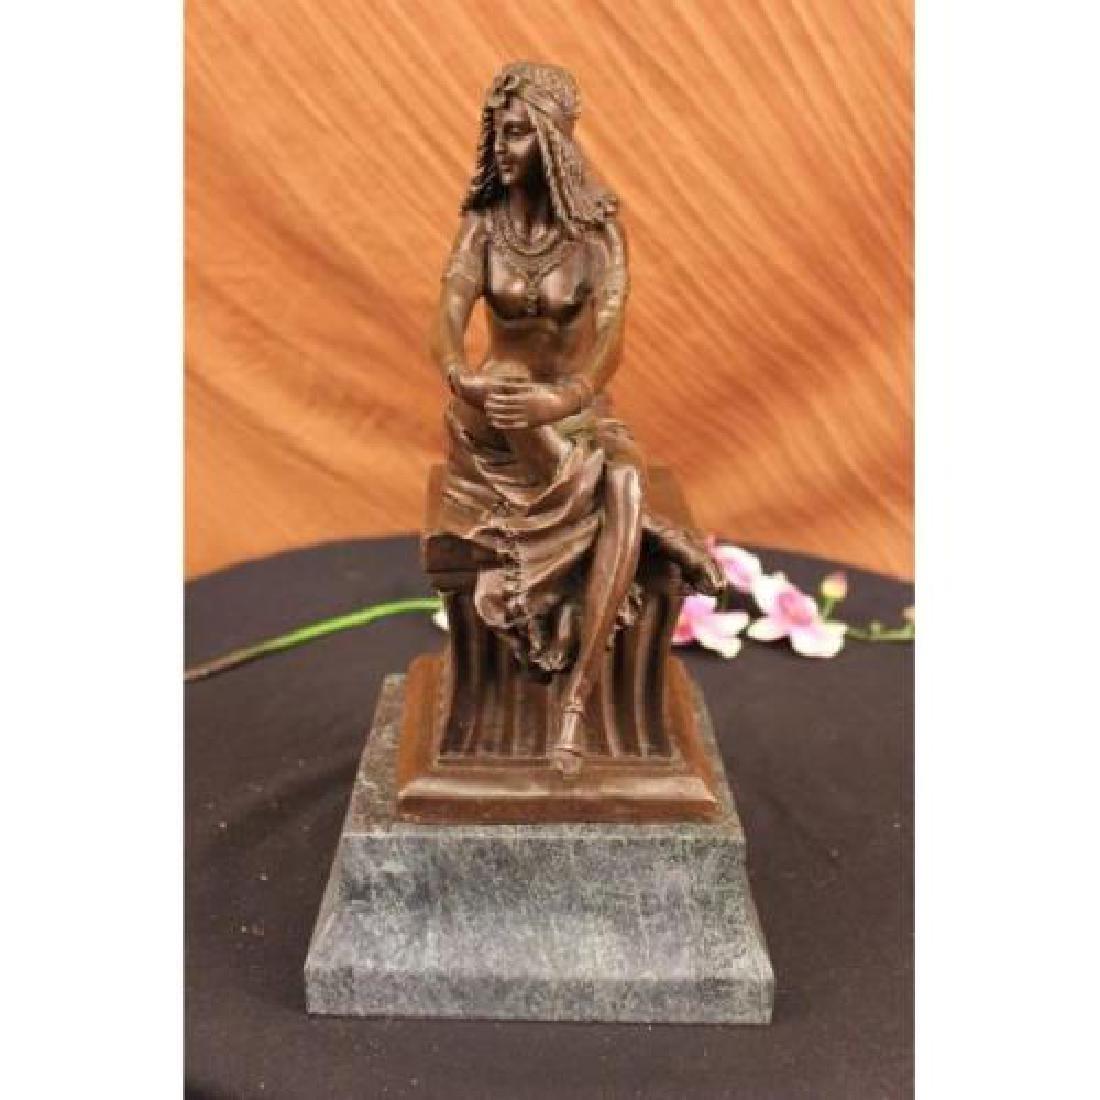 Sitting Egyptian Nude Princess Bronze Sculpture